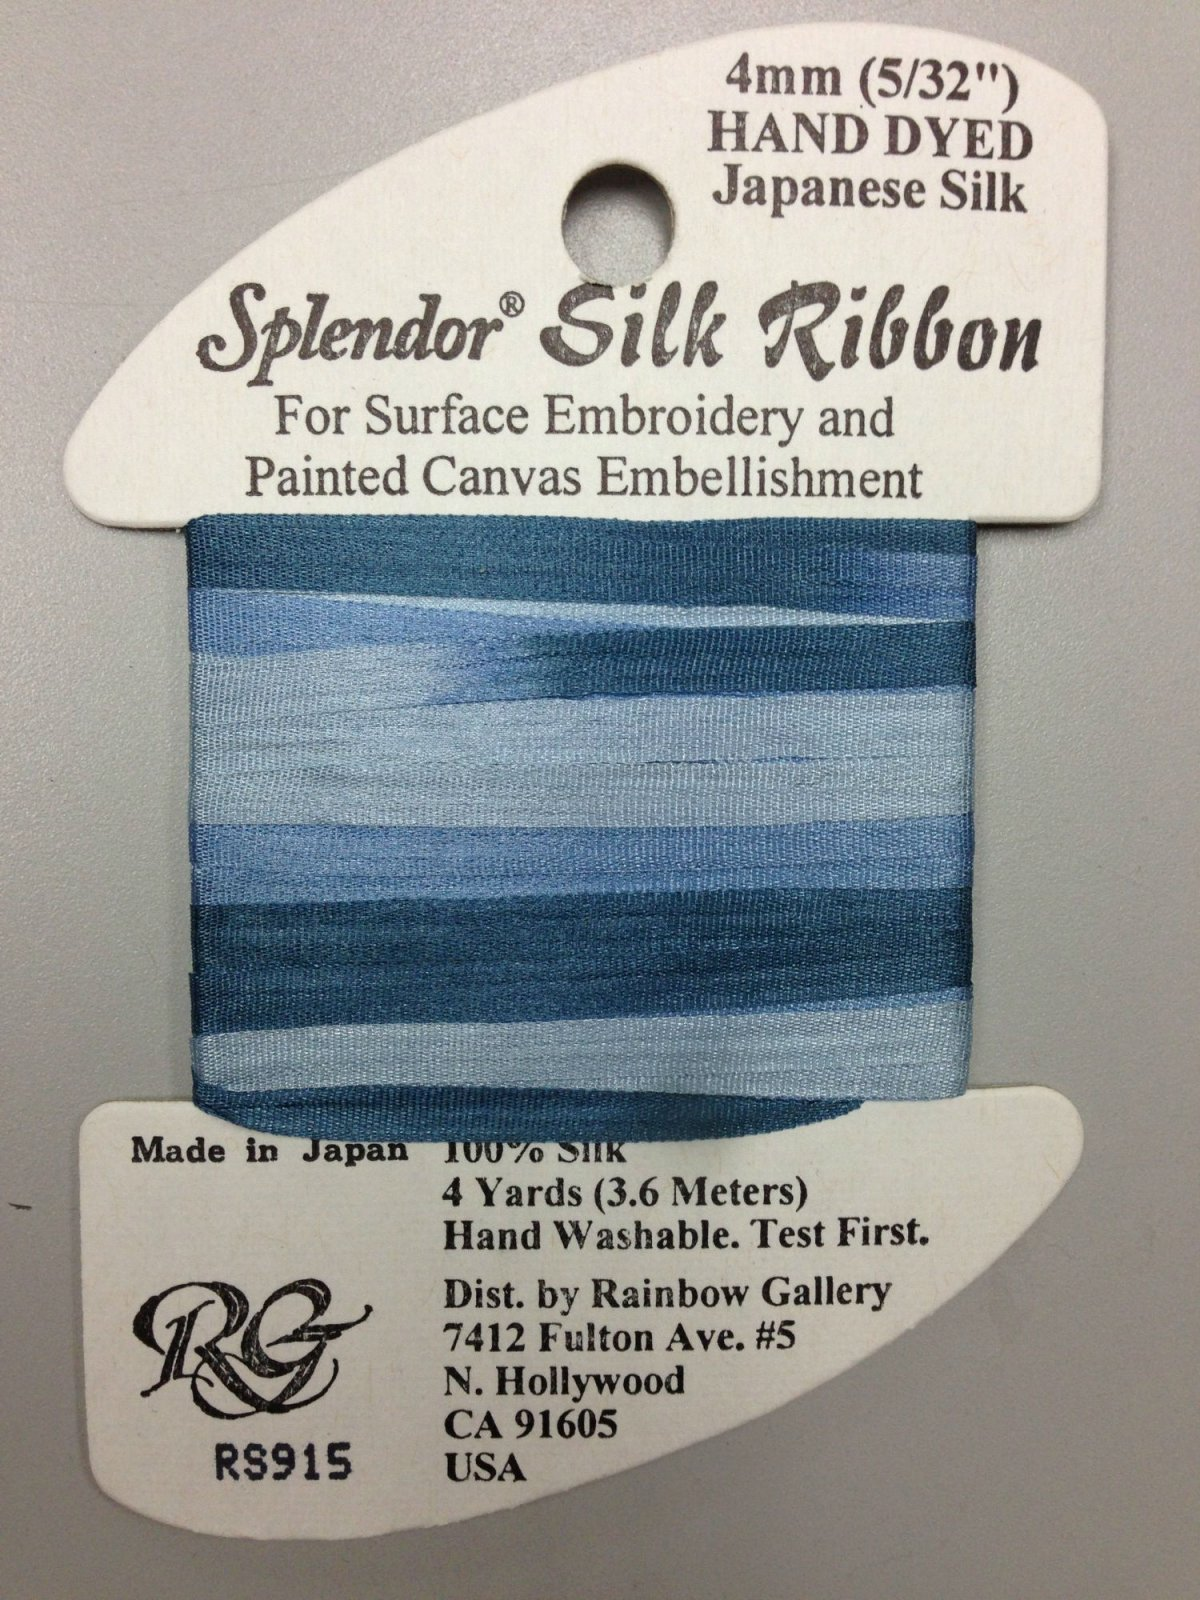 Splendor Silk Ribbon R915